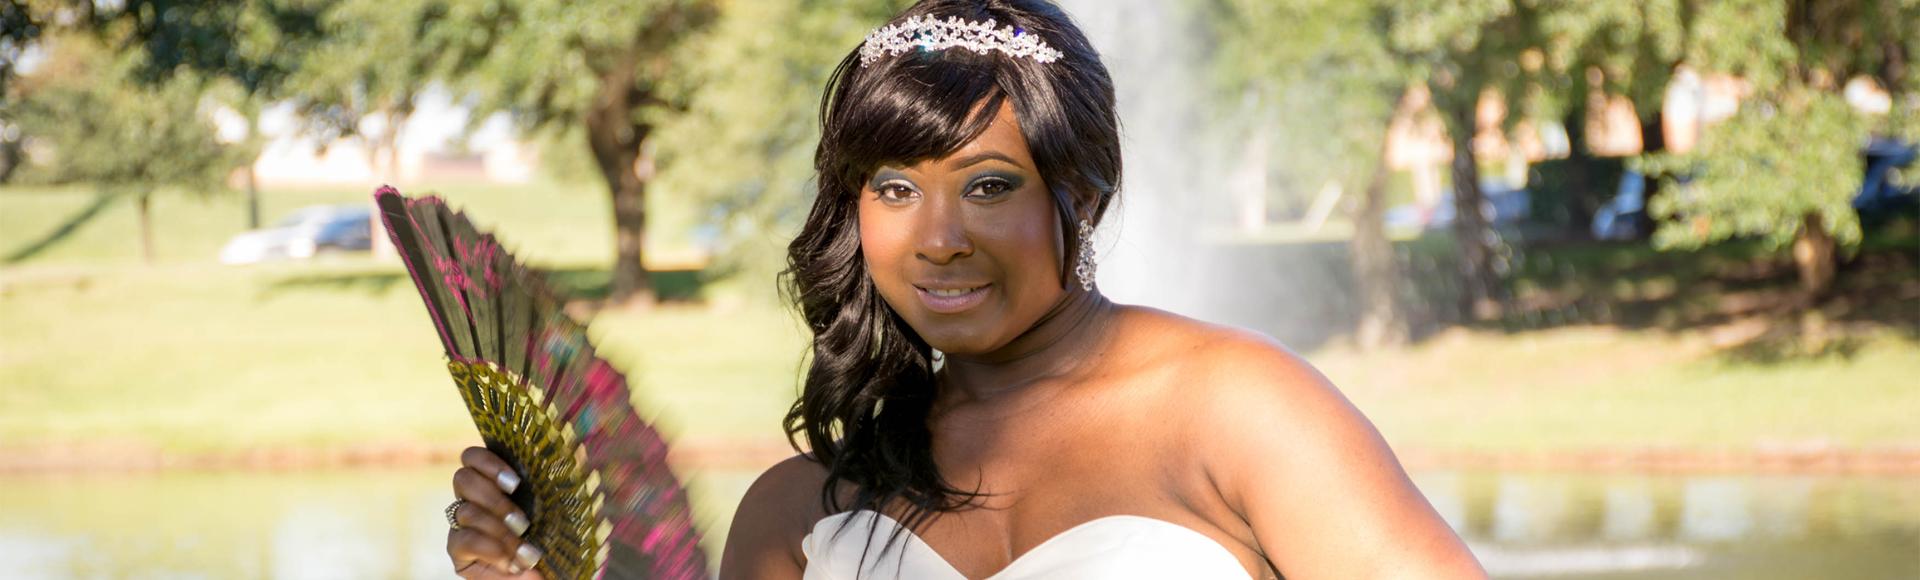 Bridal Sessions at PVG Wedding Photography